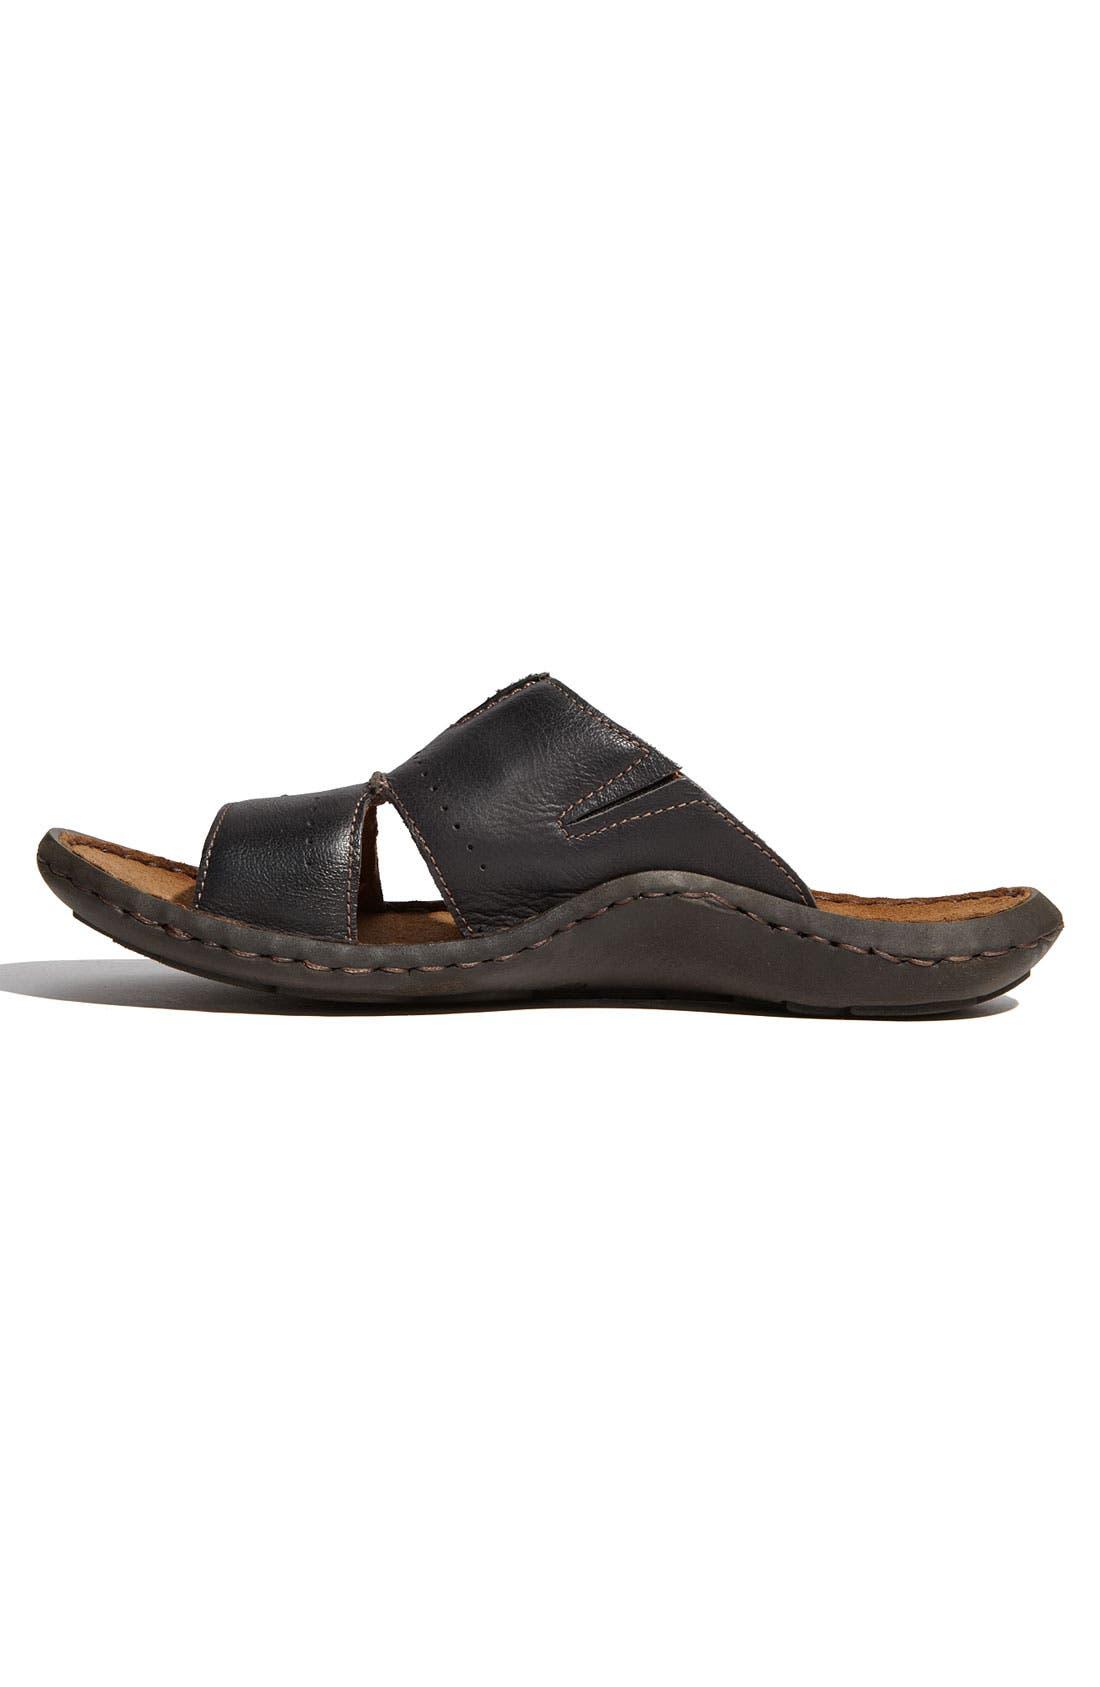 Alternate Image 2  - Josef Seibel 'Larry' Slide Sandal